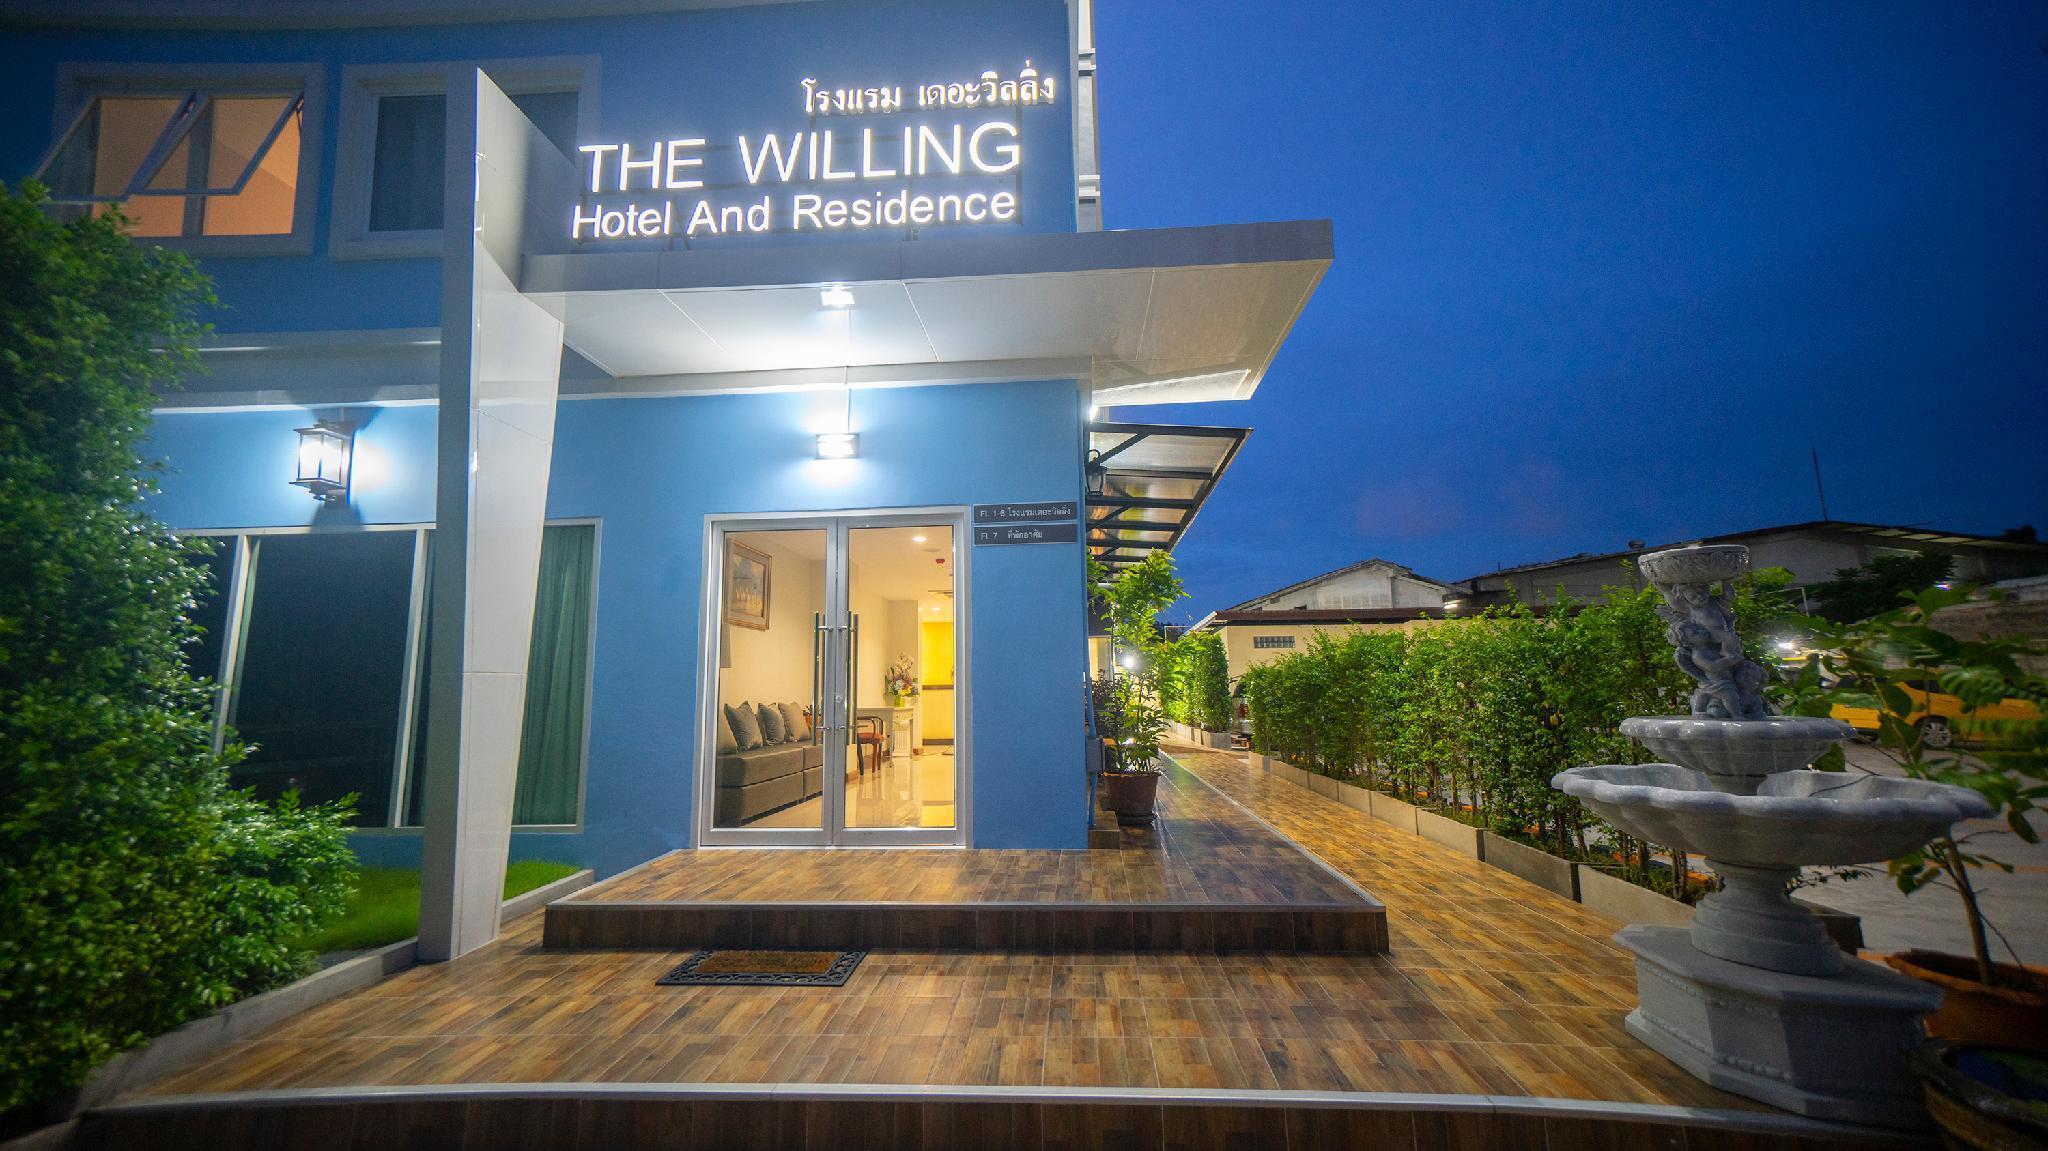 The Willing Hotel and Residence โรงแรม เดอะวิลลิ่ง